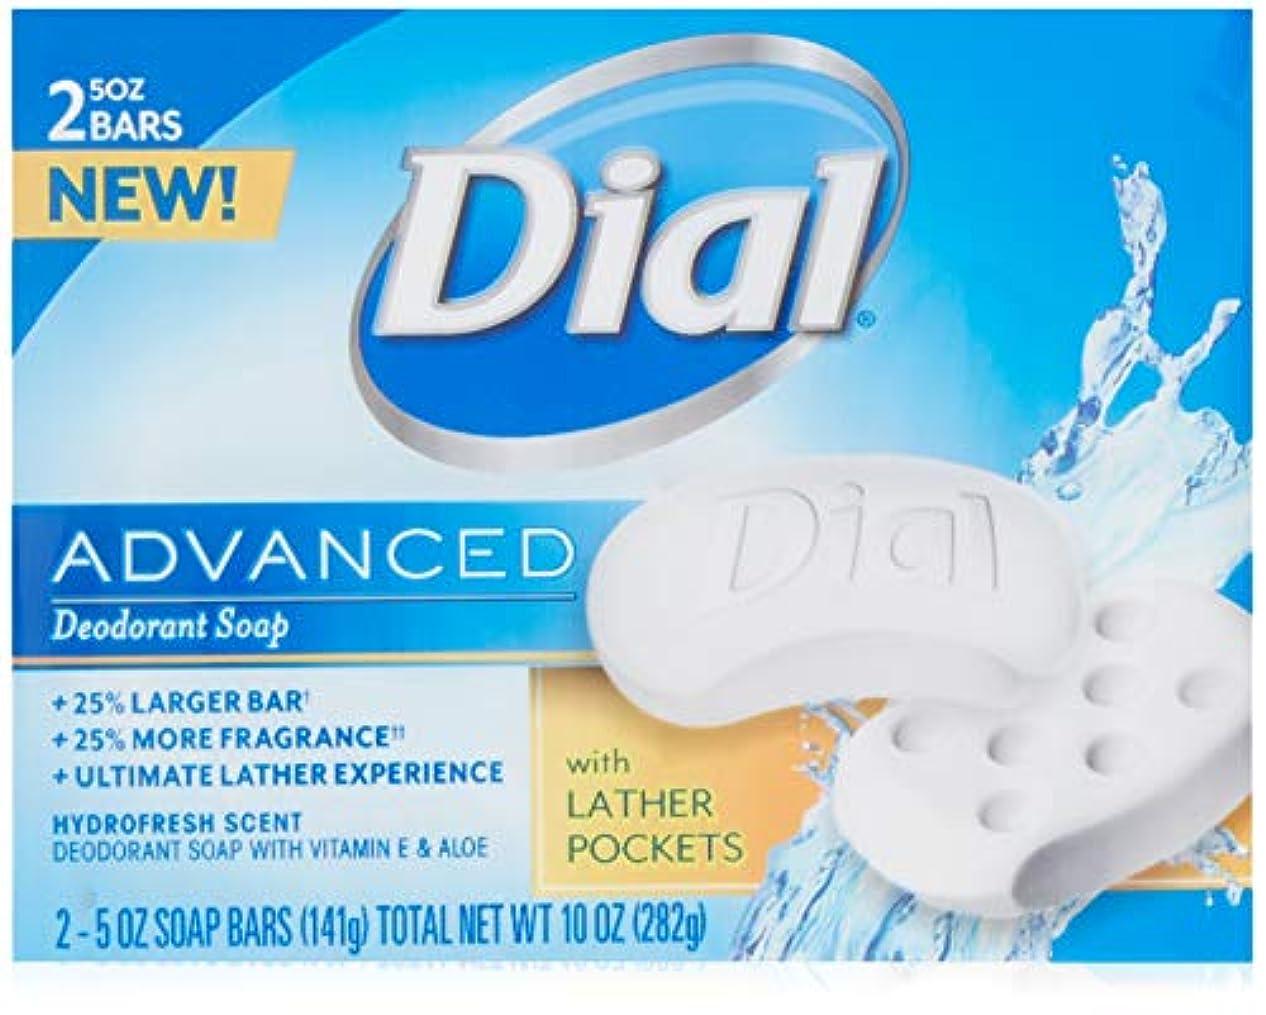 Dial 高度なデオドラントソープバーHydrofresh香り、10オズ